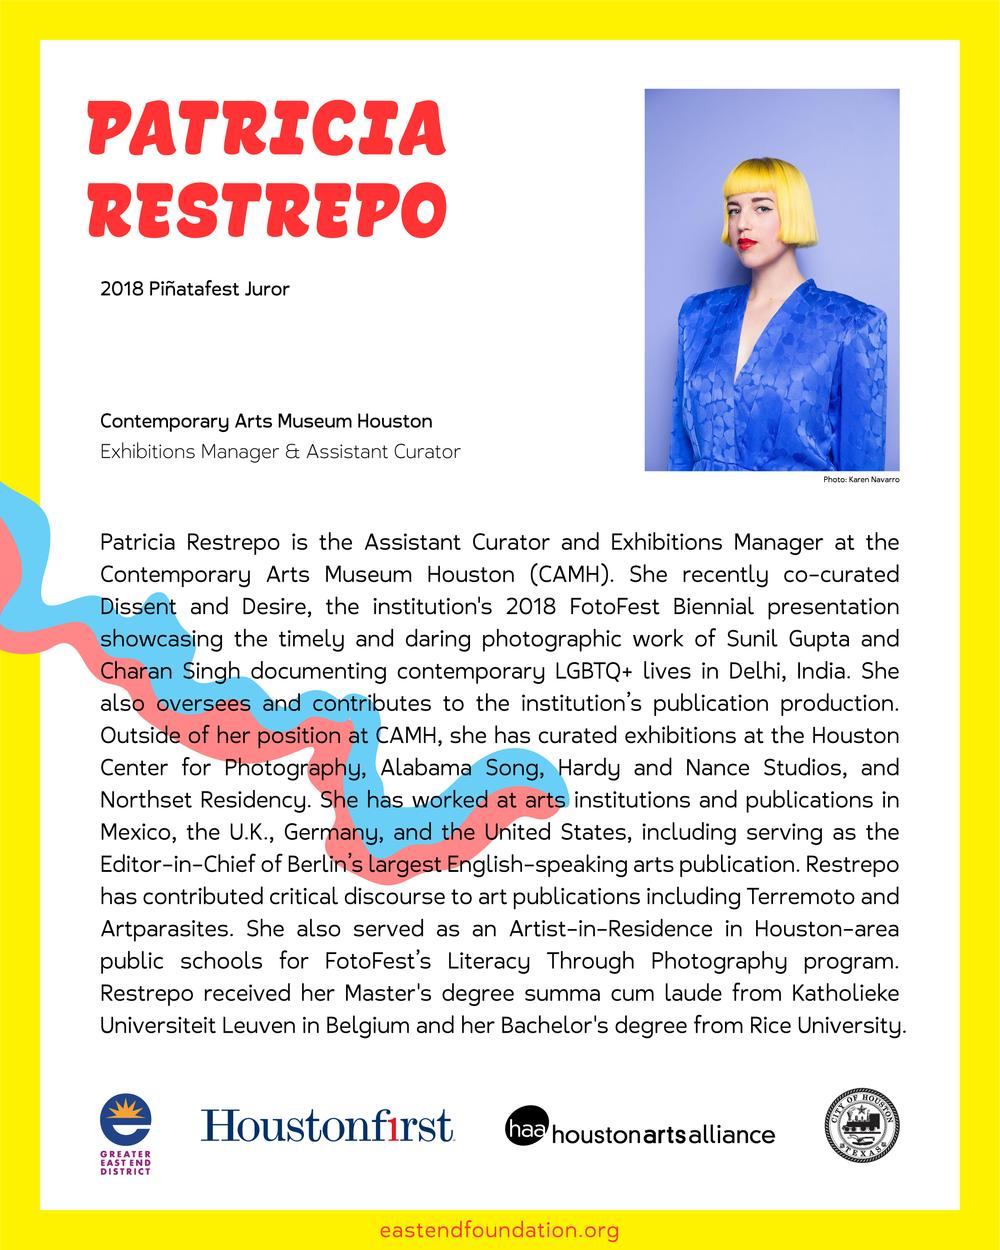 Pinatafest_2018_East_End_Foundation_Houston_Patricia_Restrepo.png